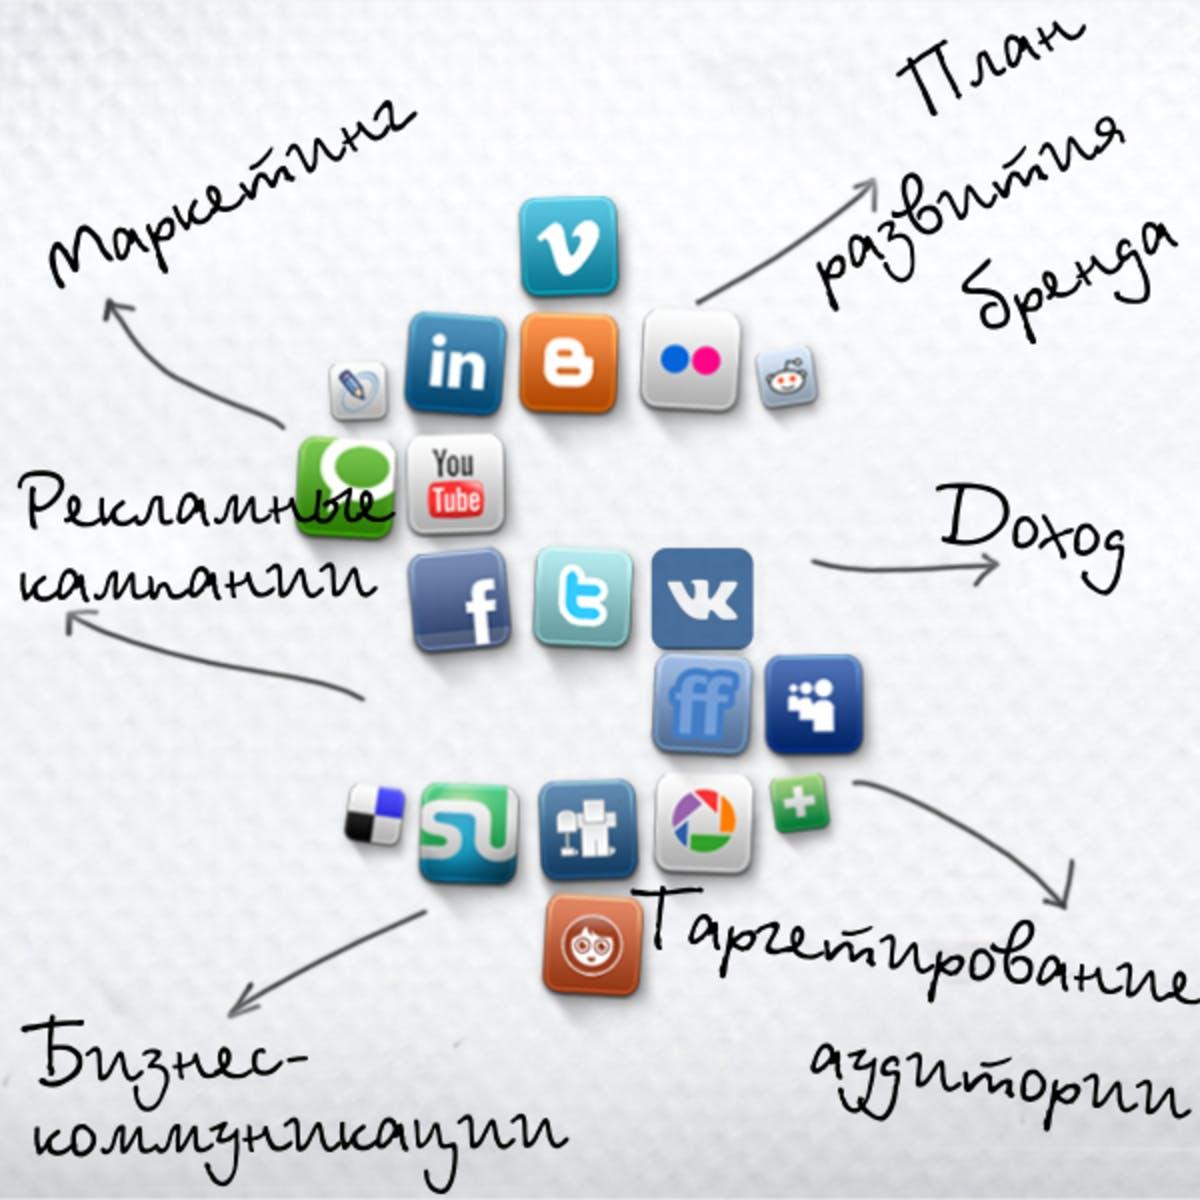 SMM-кампания: цели, стратегия, алгоритм, SMM-активности